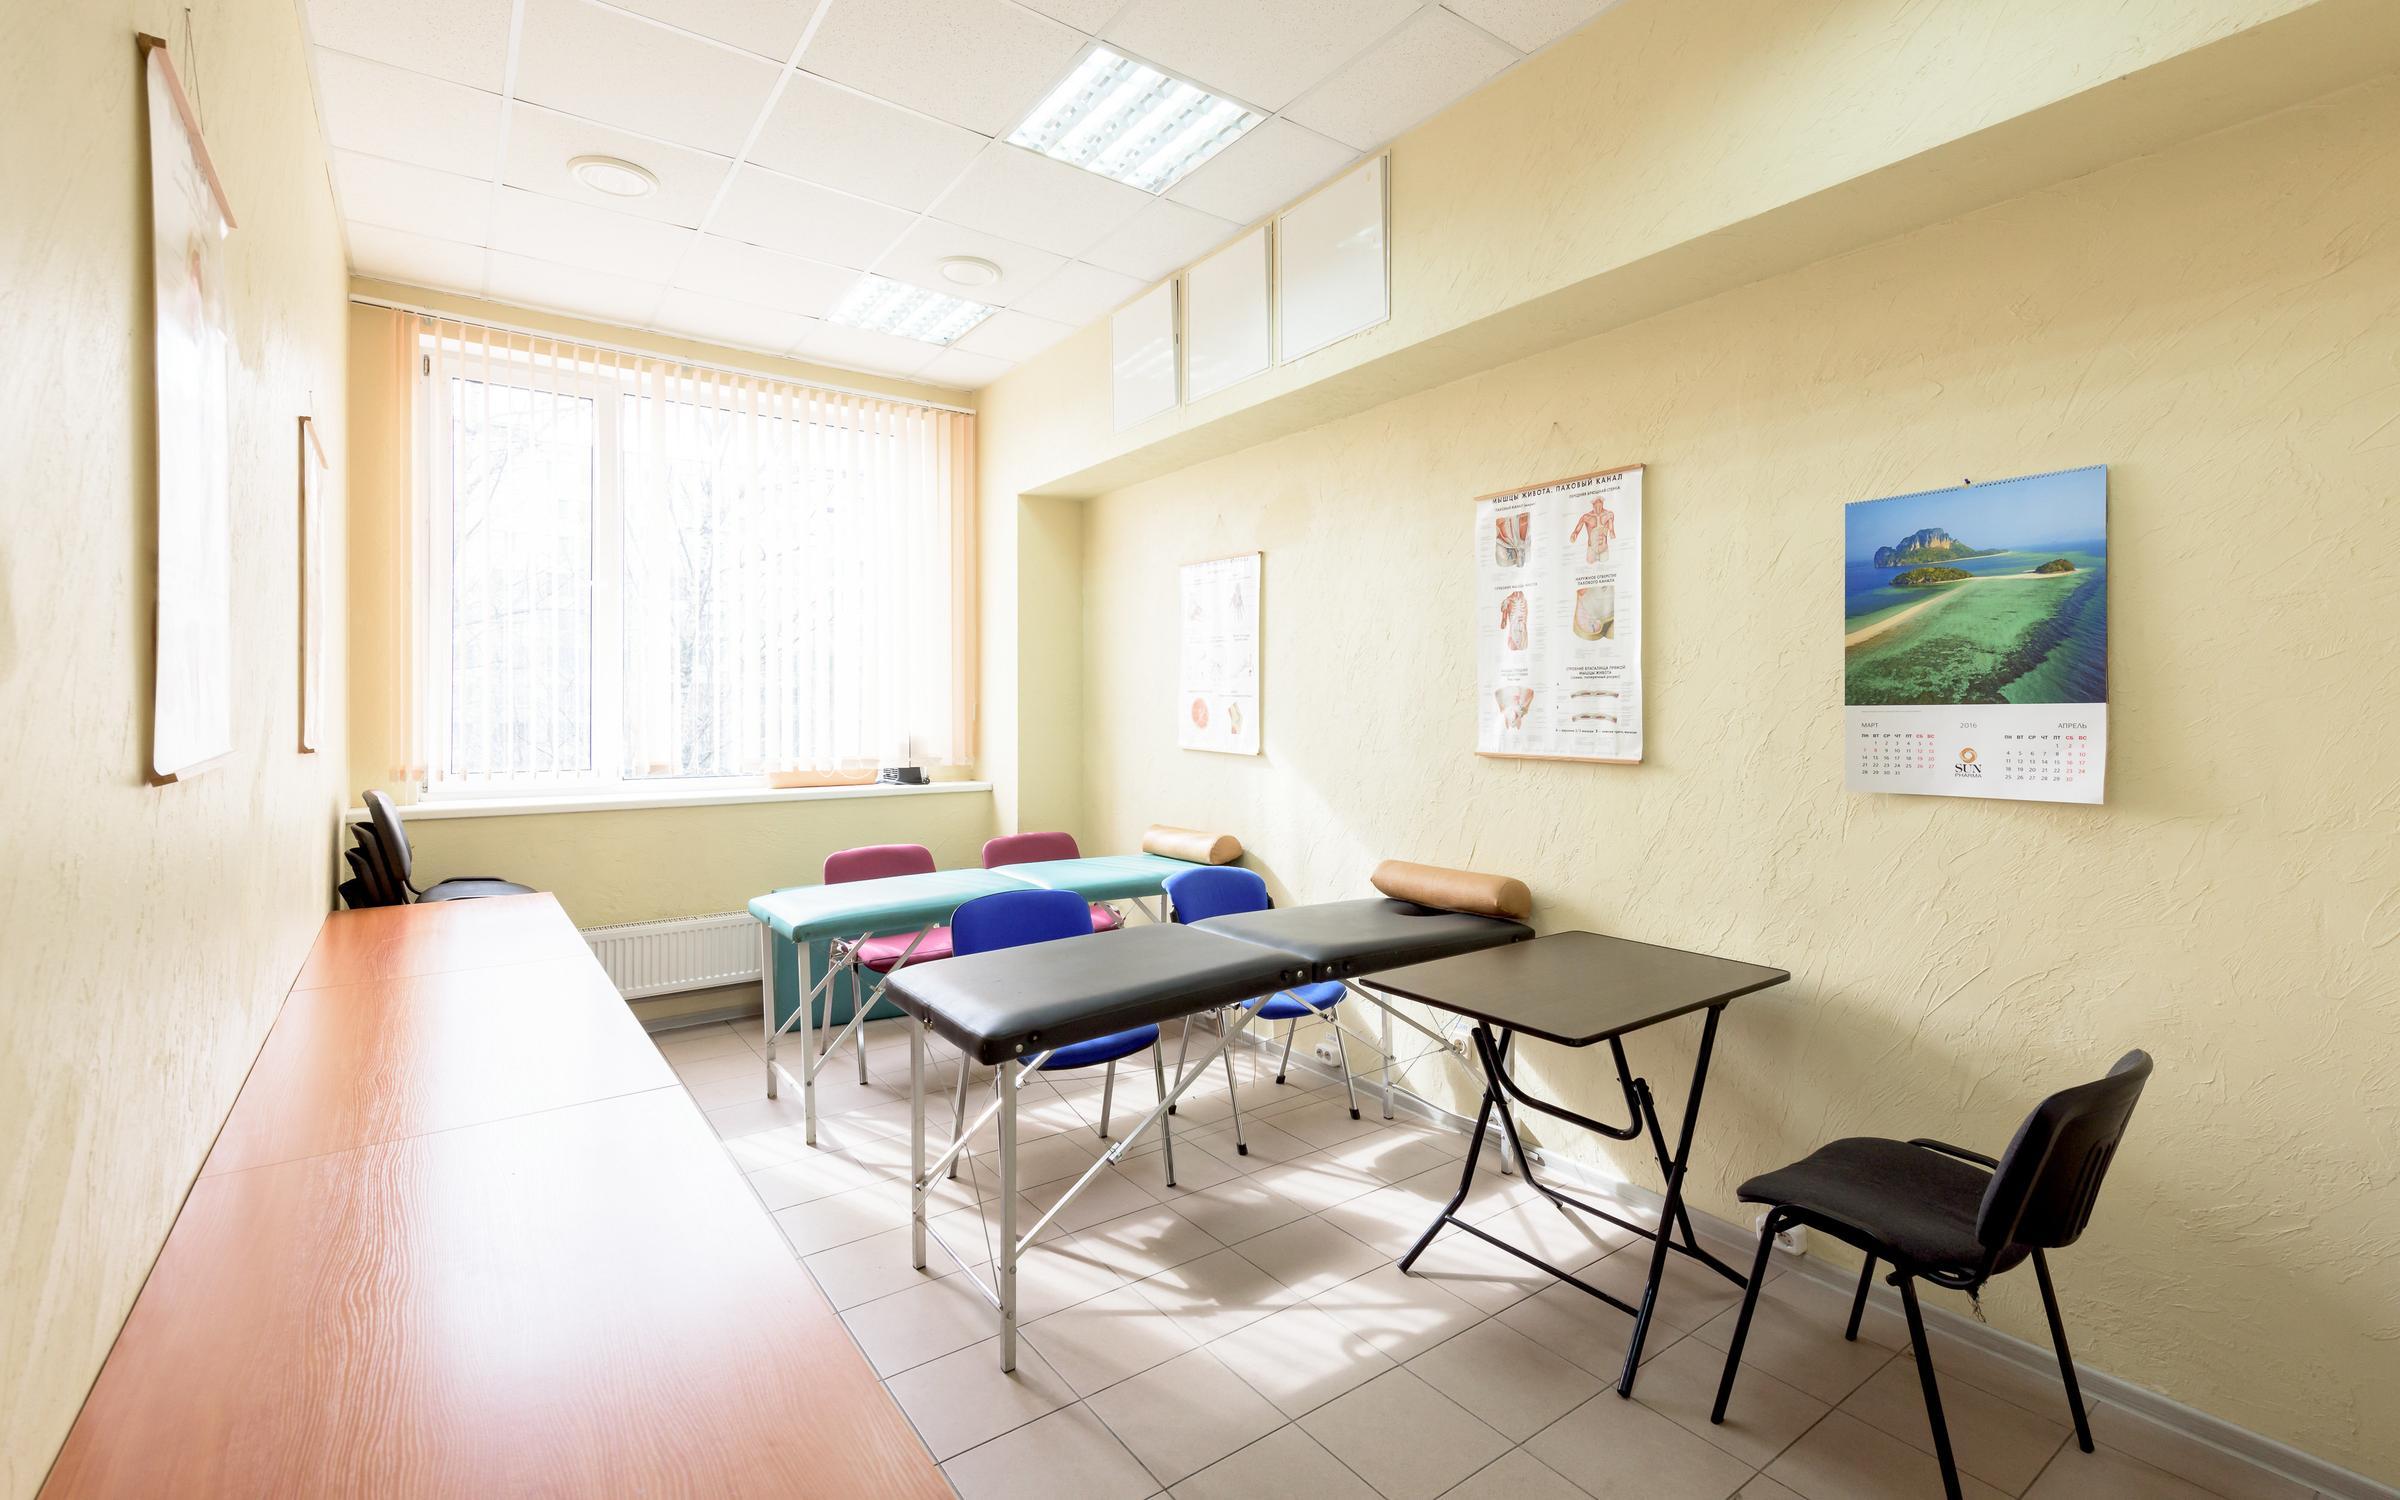 фотография Учебного центра Коннессанс у метро Международная